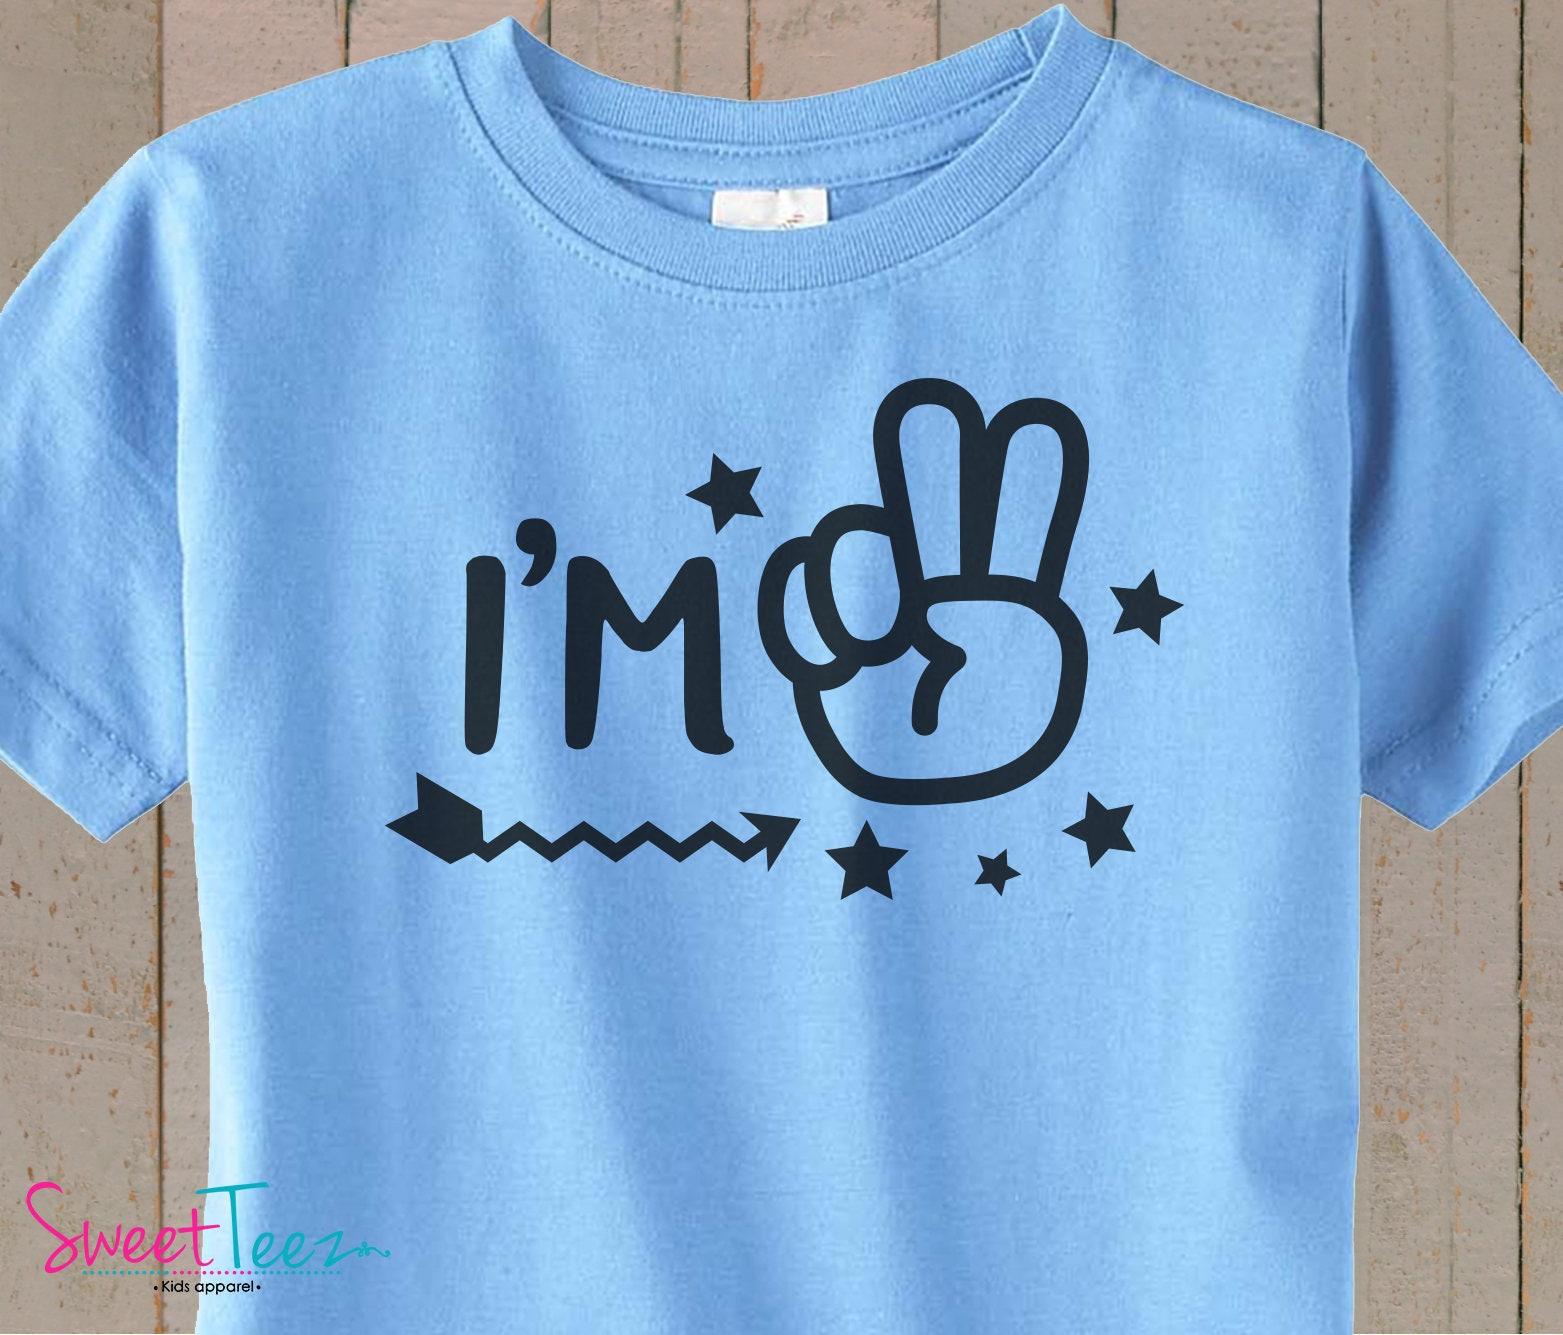 2nd Birthday Shirt Im 2 Second Boy Girl Green Blue Tshirt